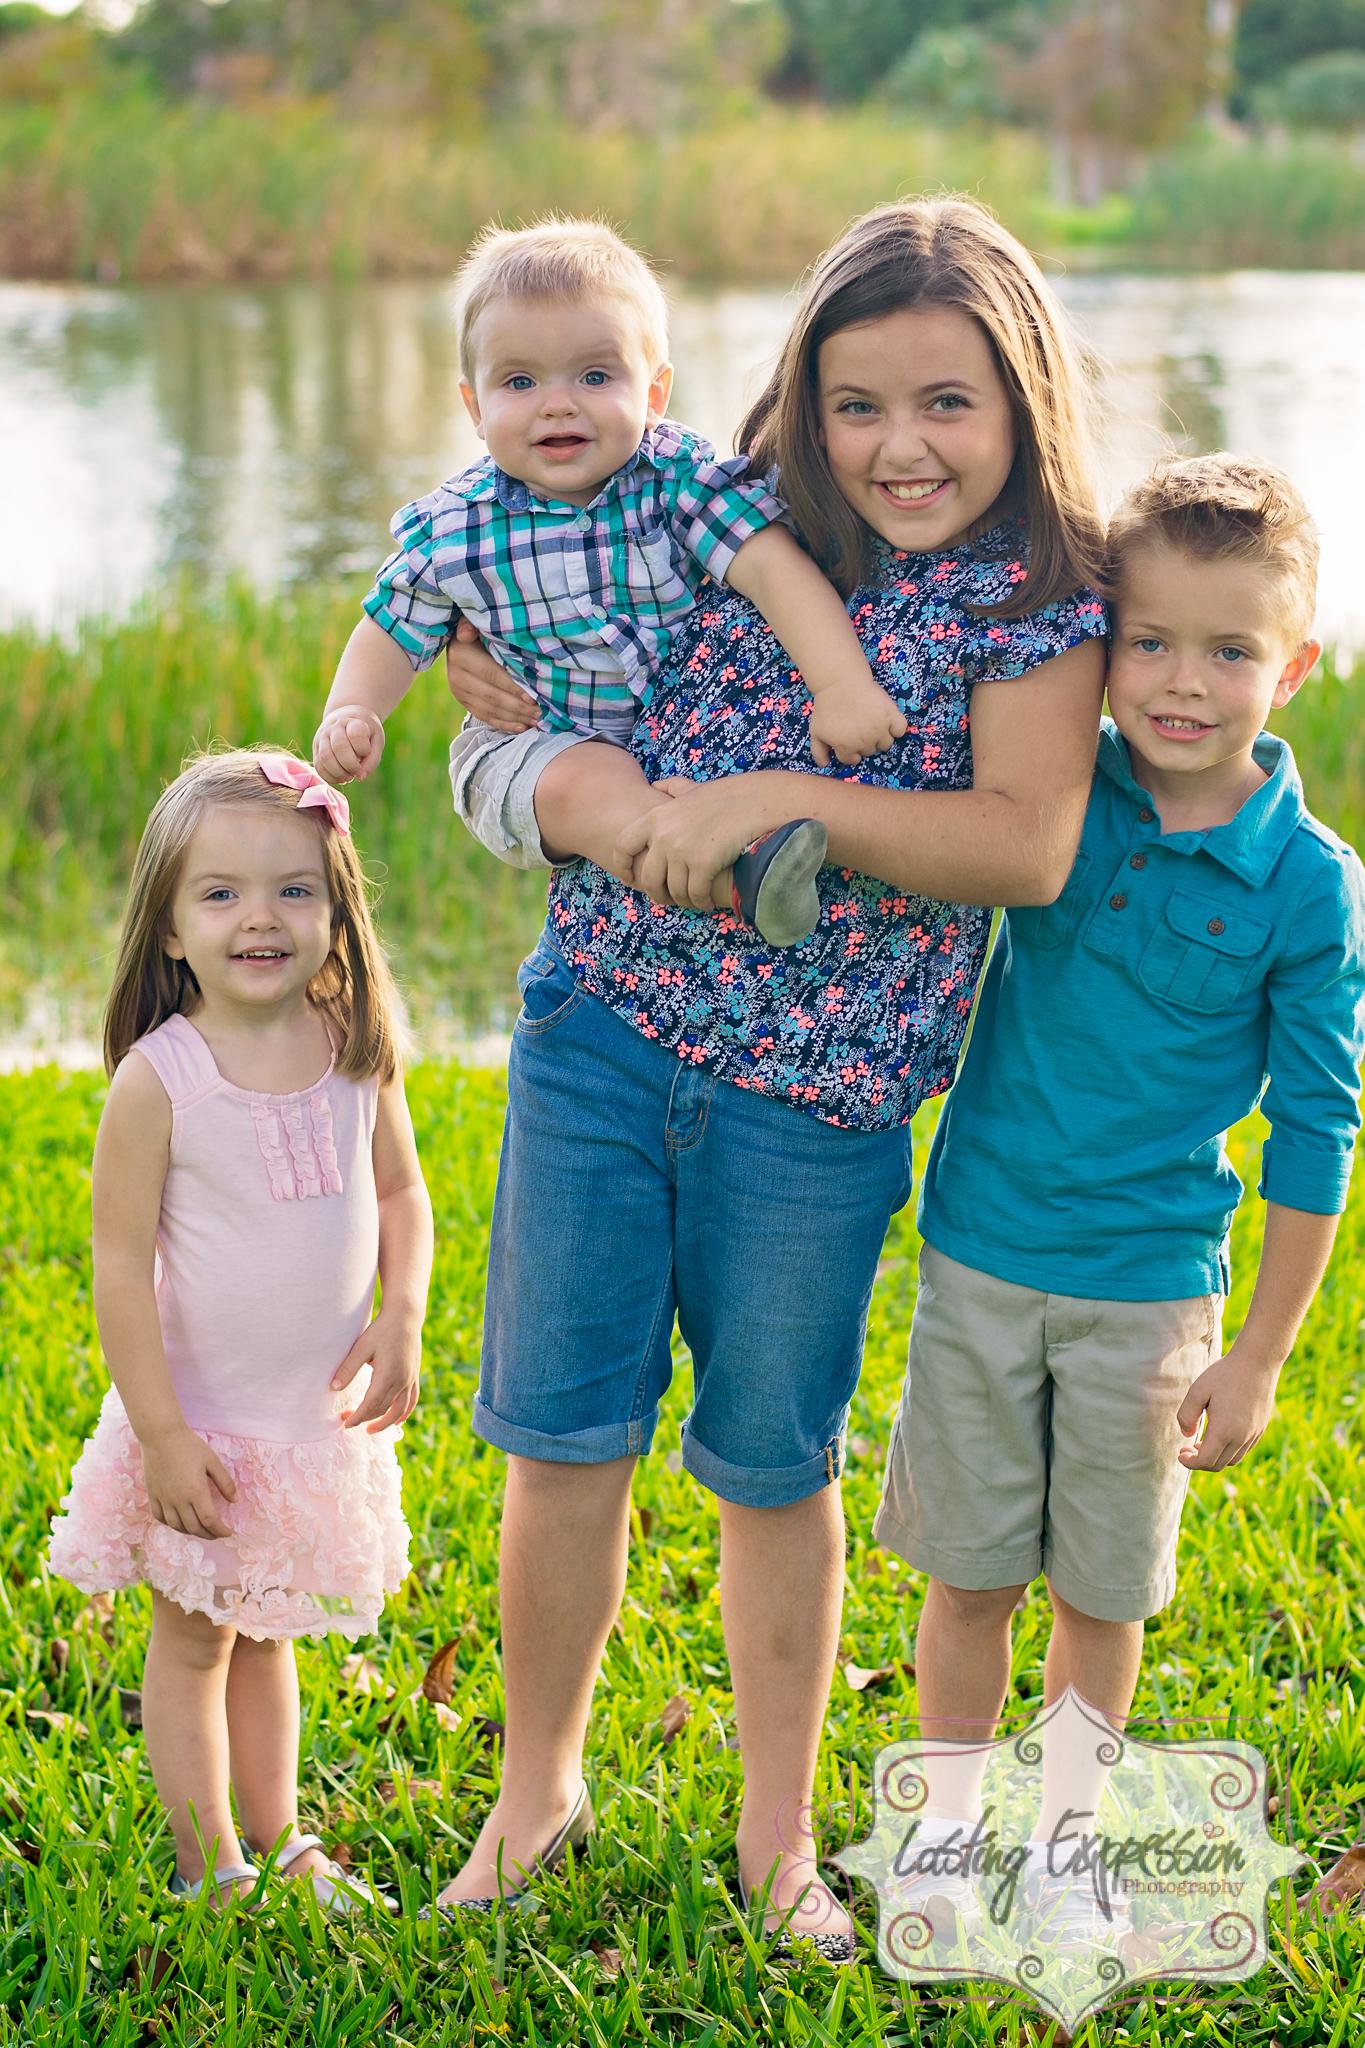 frodgefamily-4logo.jpg